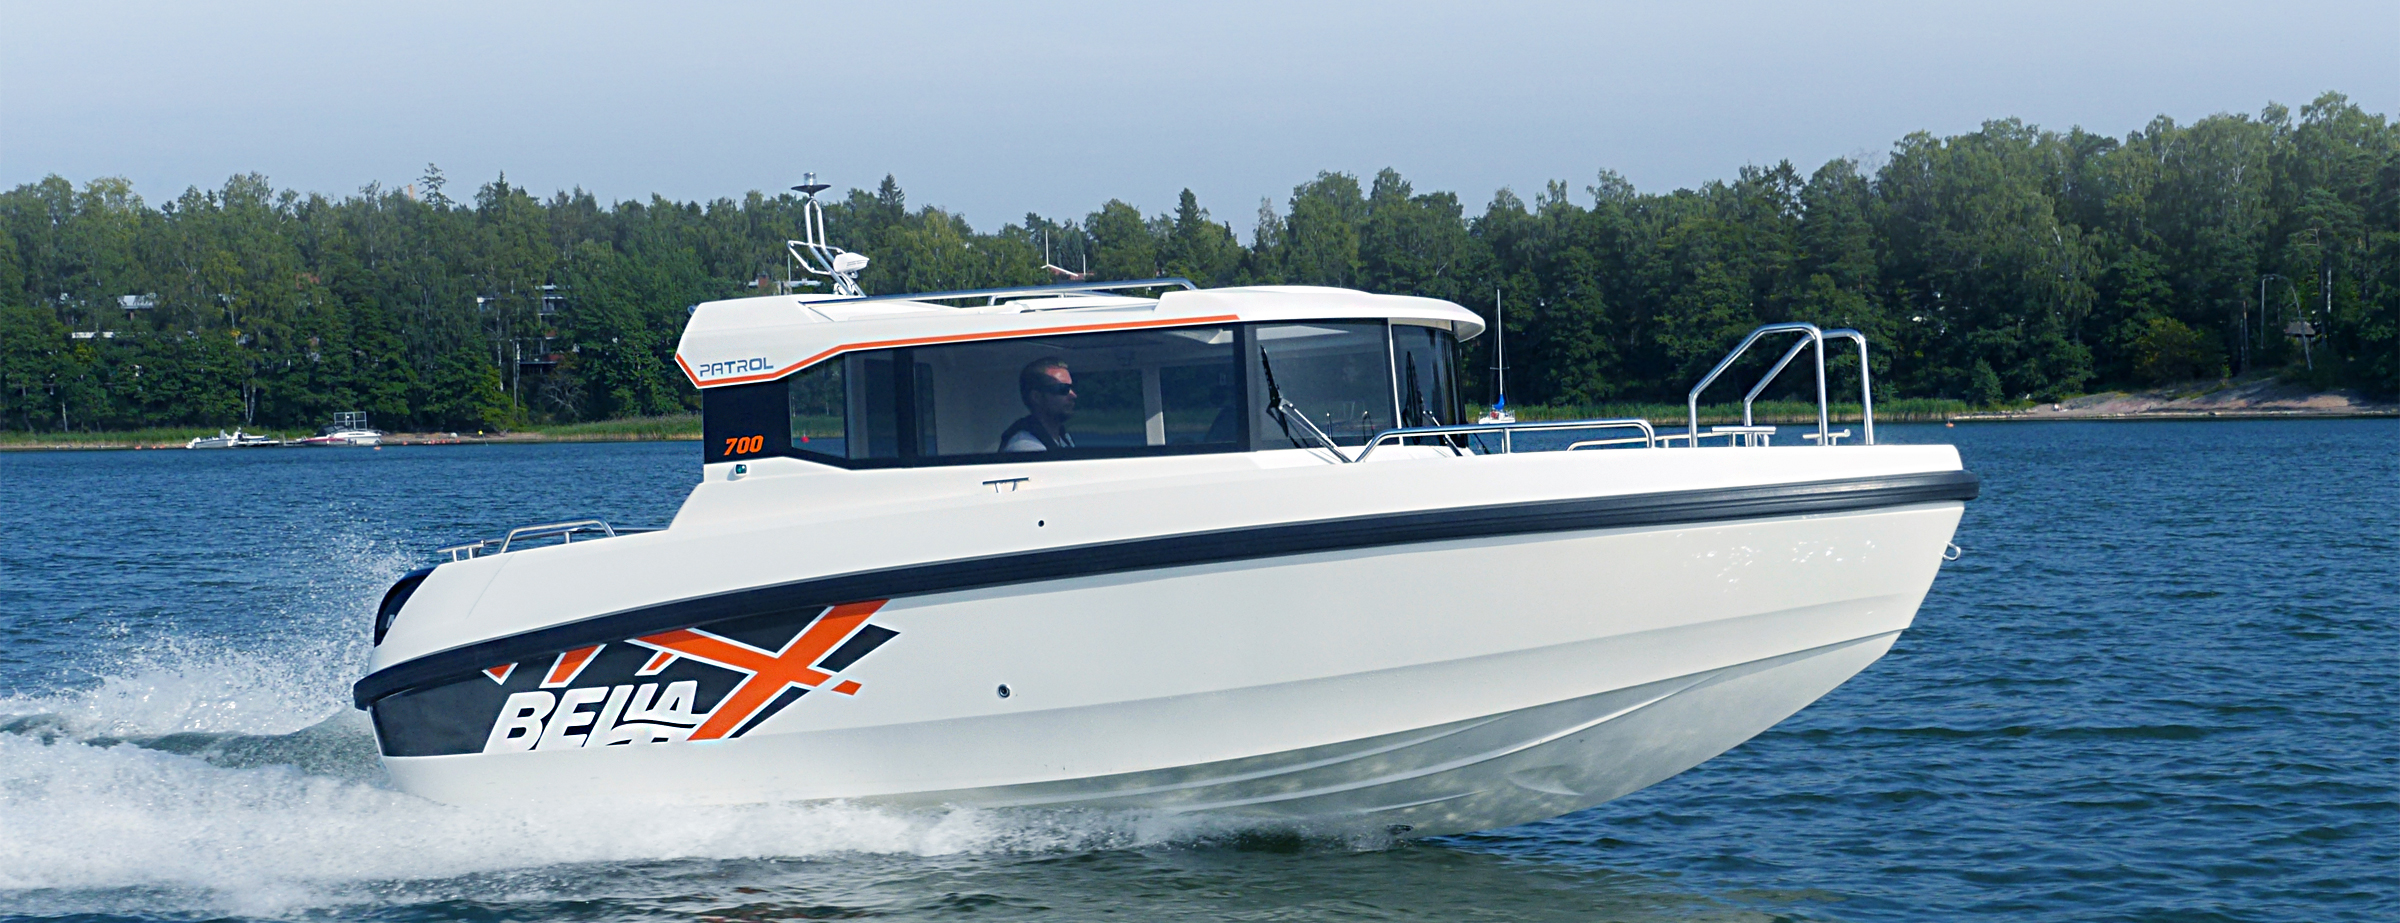 bella båtar reservdelar